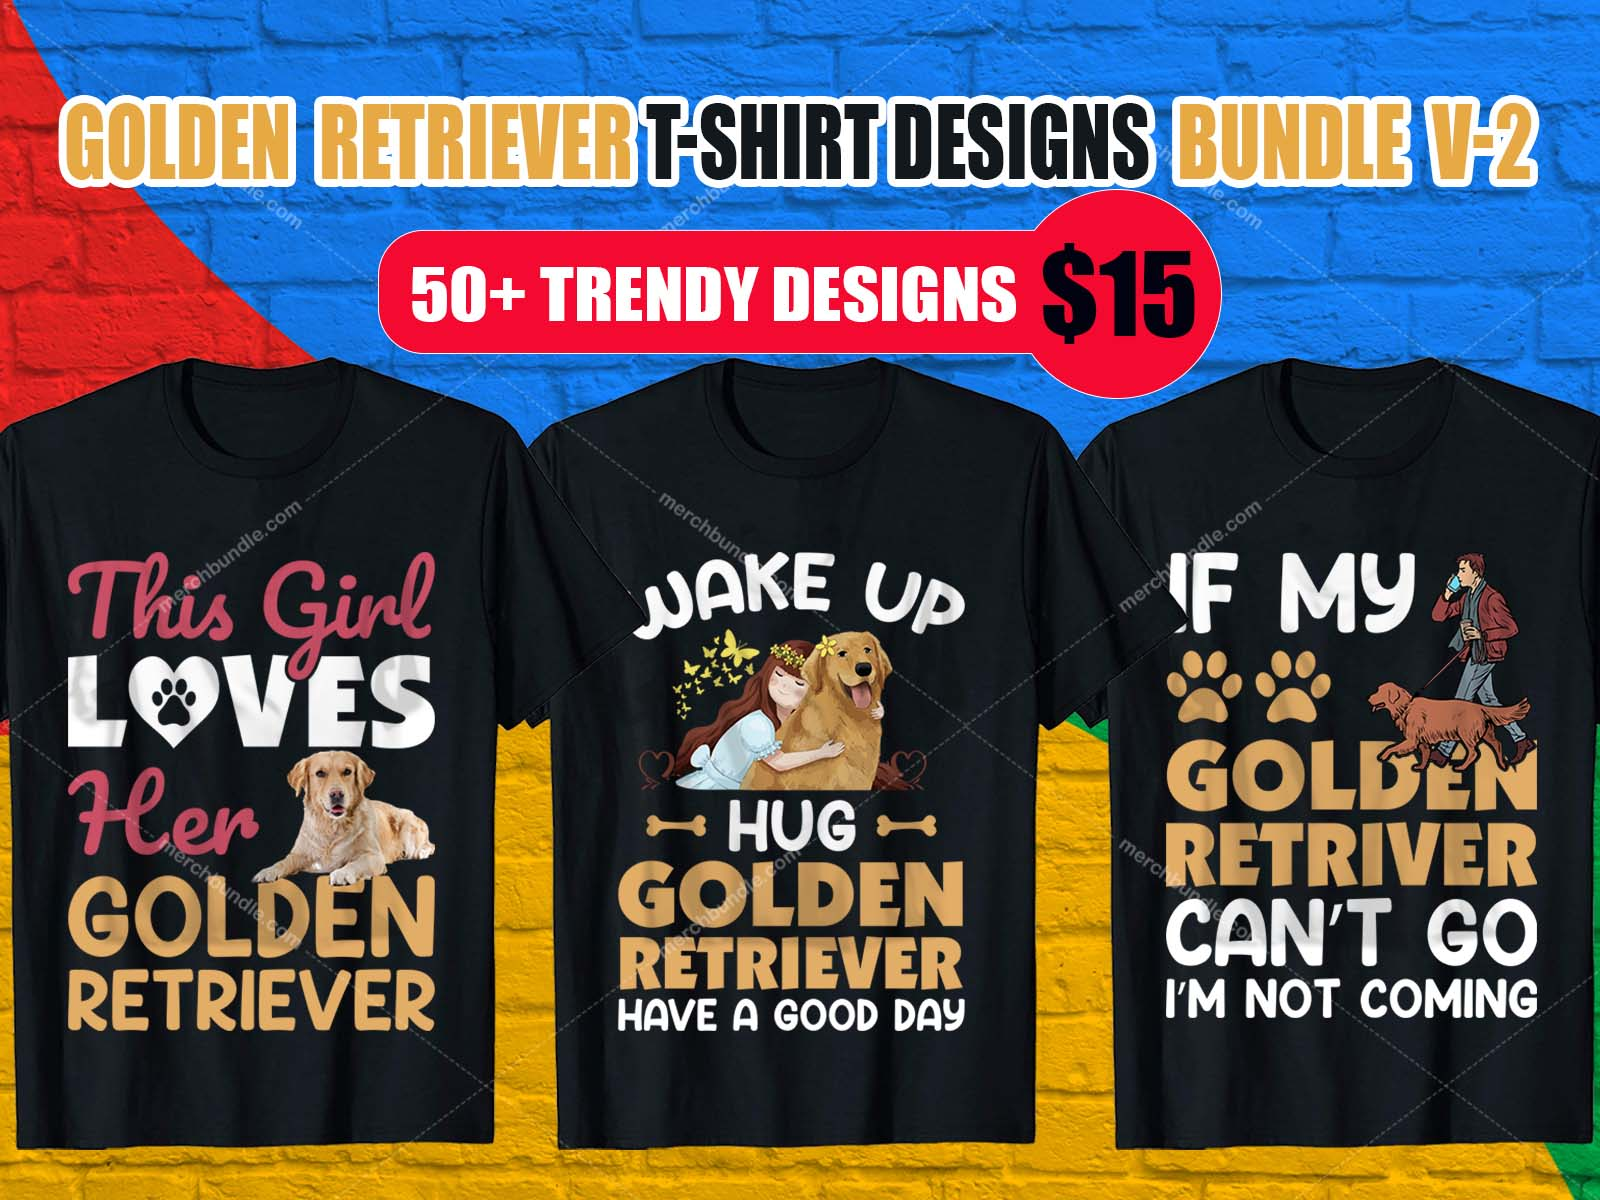 Golden Retriever T-Shirt Designs Bundle